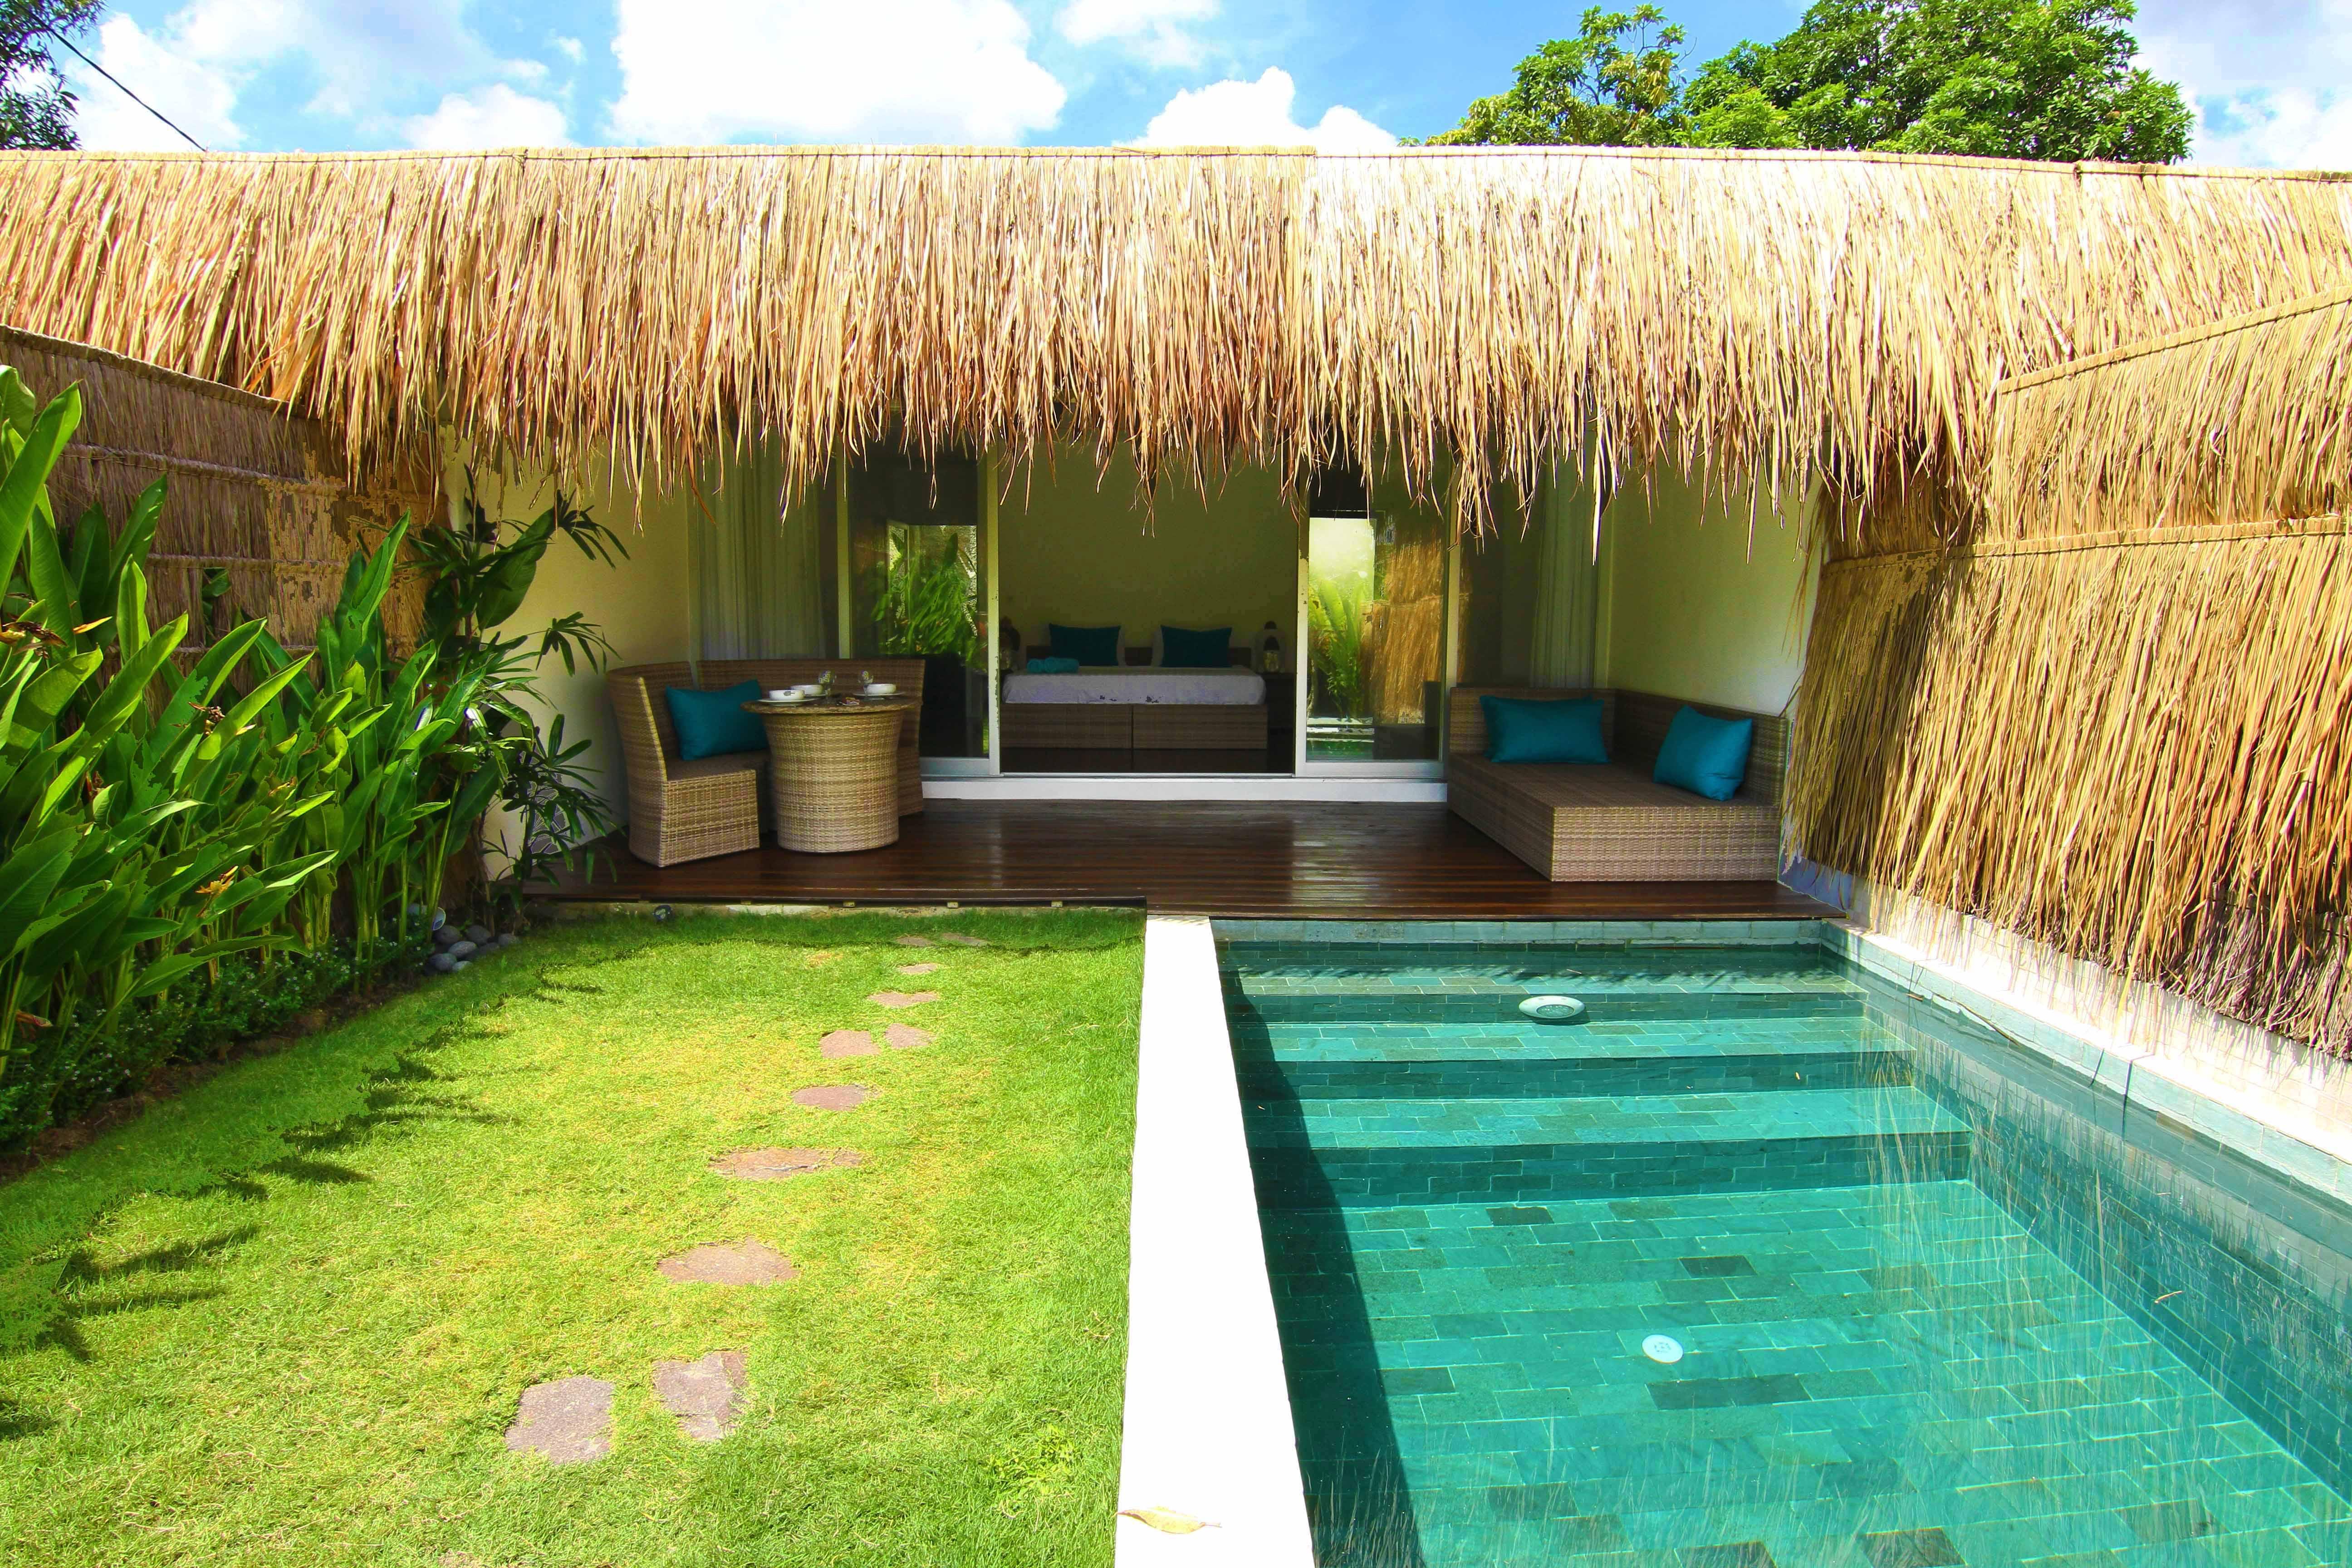 Tropical Suite Villa Private Pool 1 Villas For Rent In Canggu Bali Indonesia